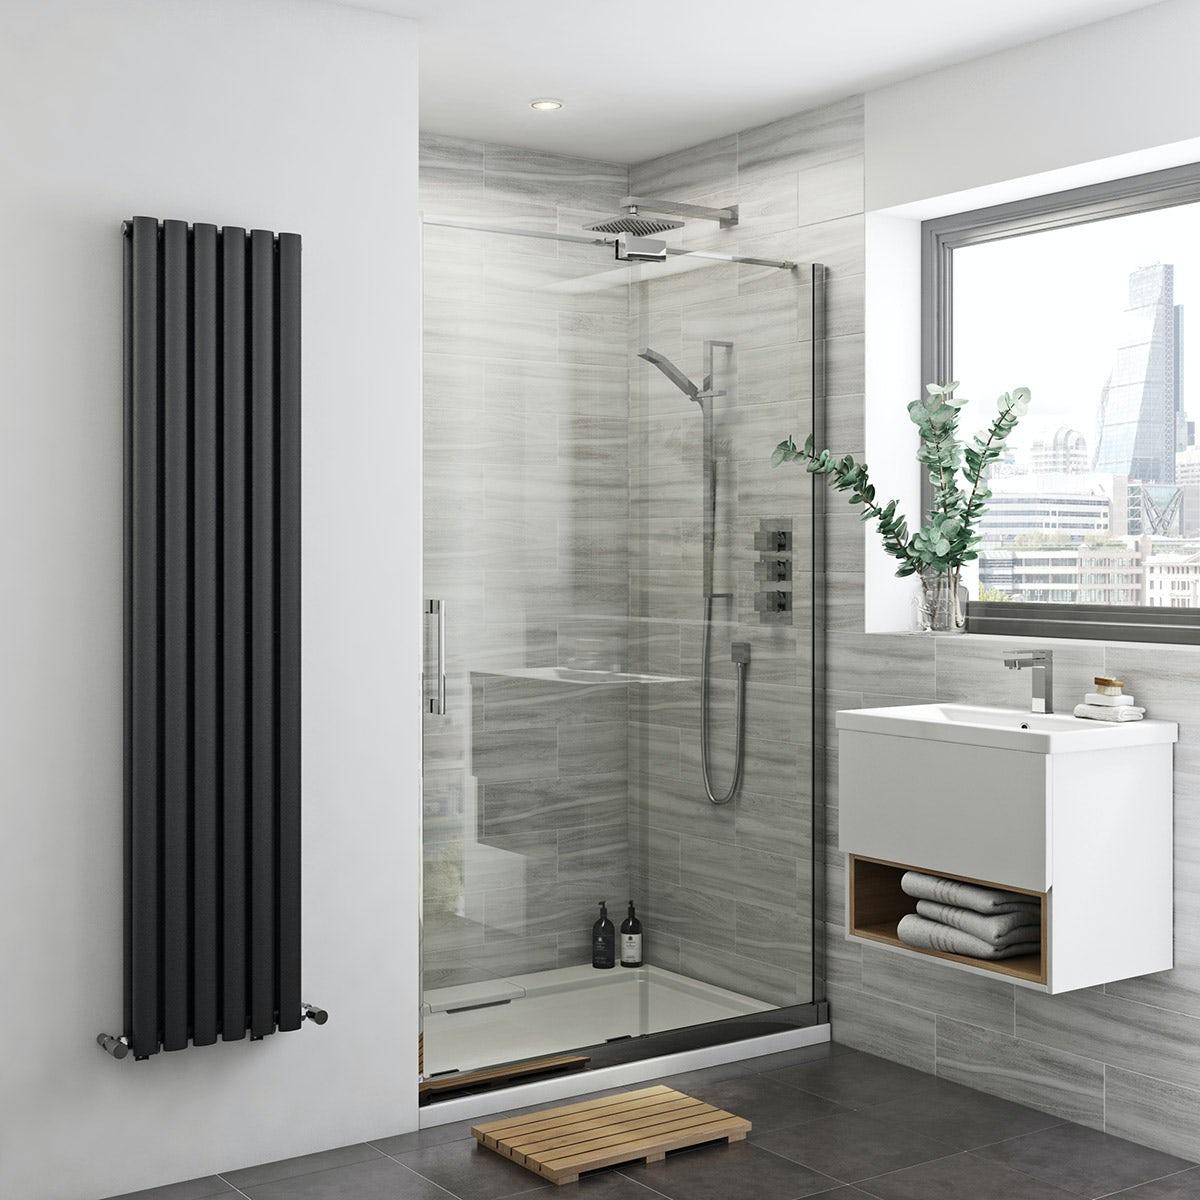 Carter 8mm easy clean right handed sliding shower door